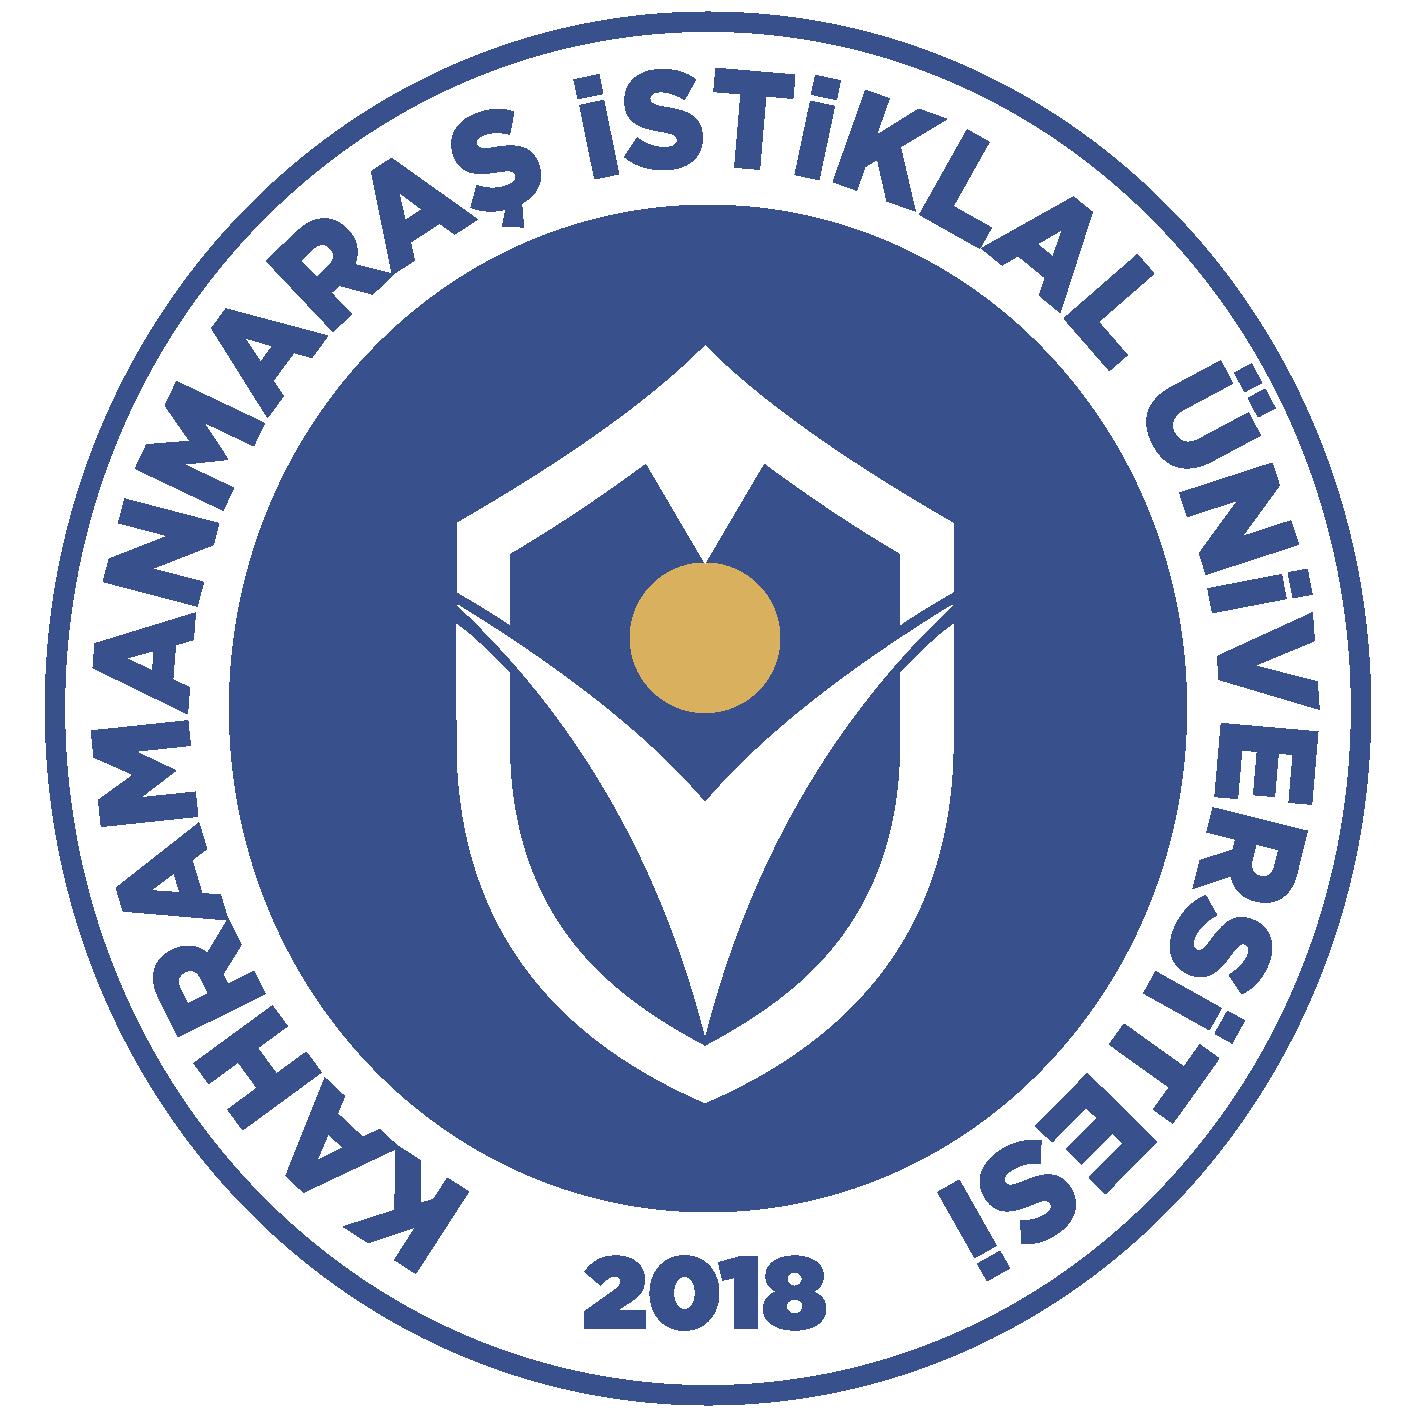 Kahramanmaraş İstiklal Üniversitesi5889